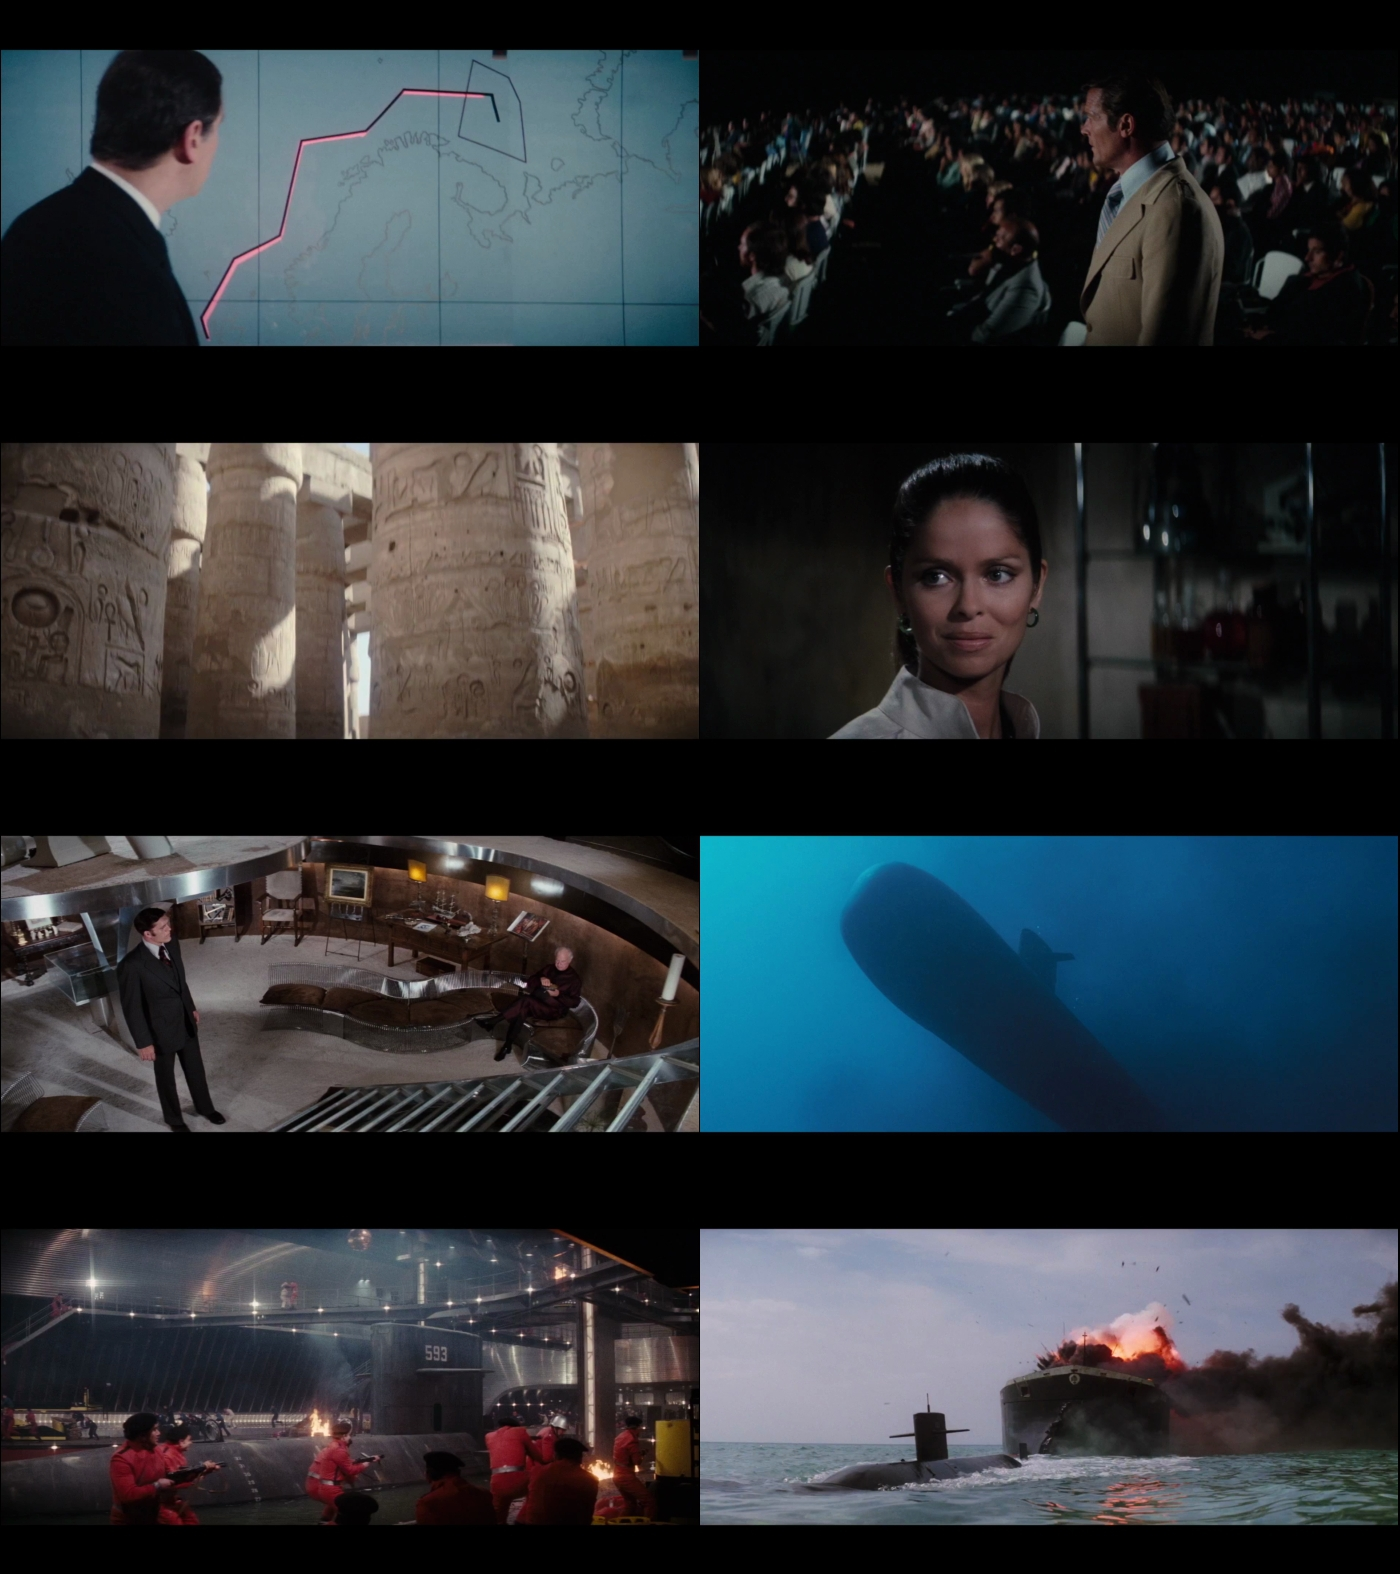 007 La espia que me amo 1080p Latino